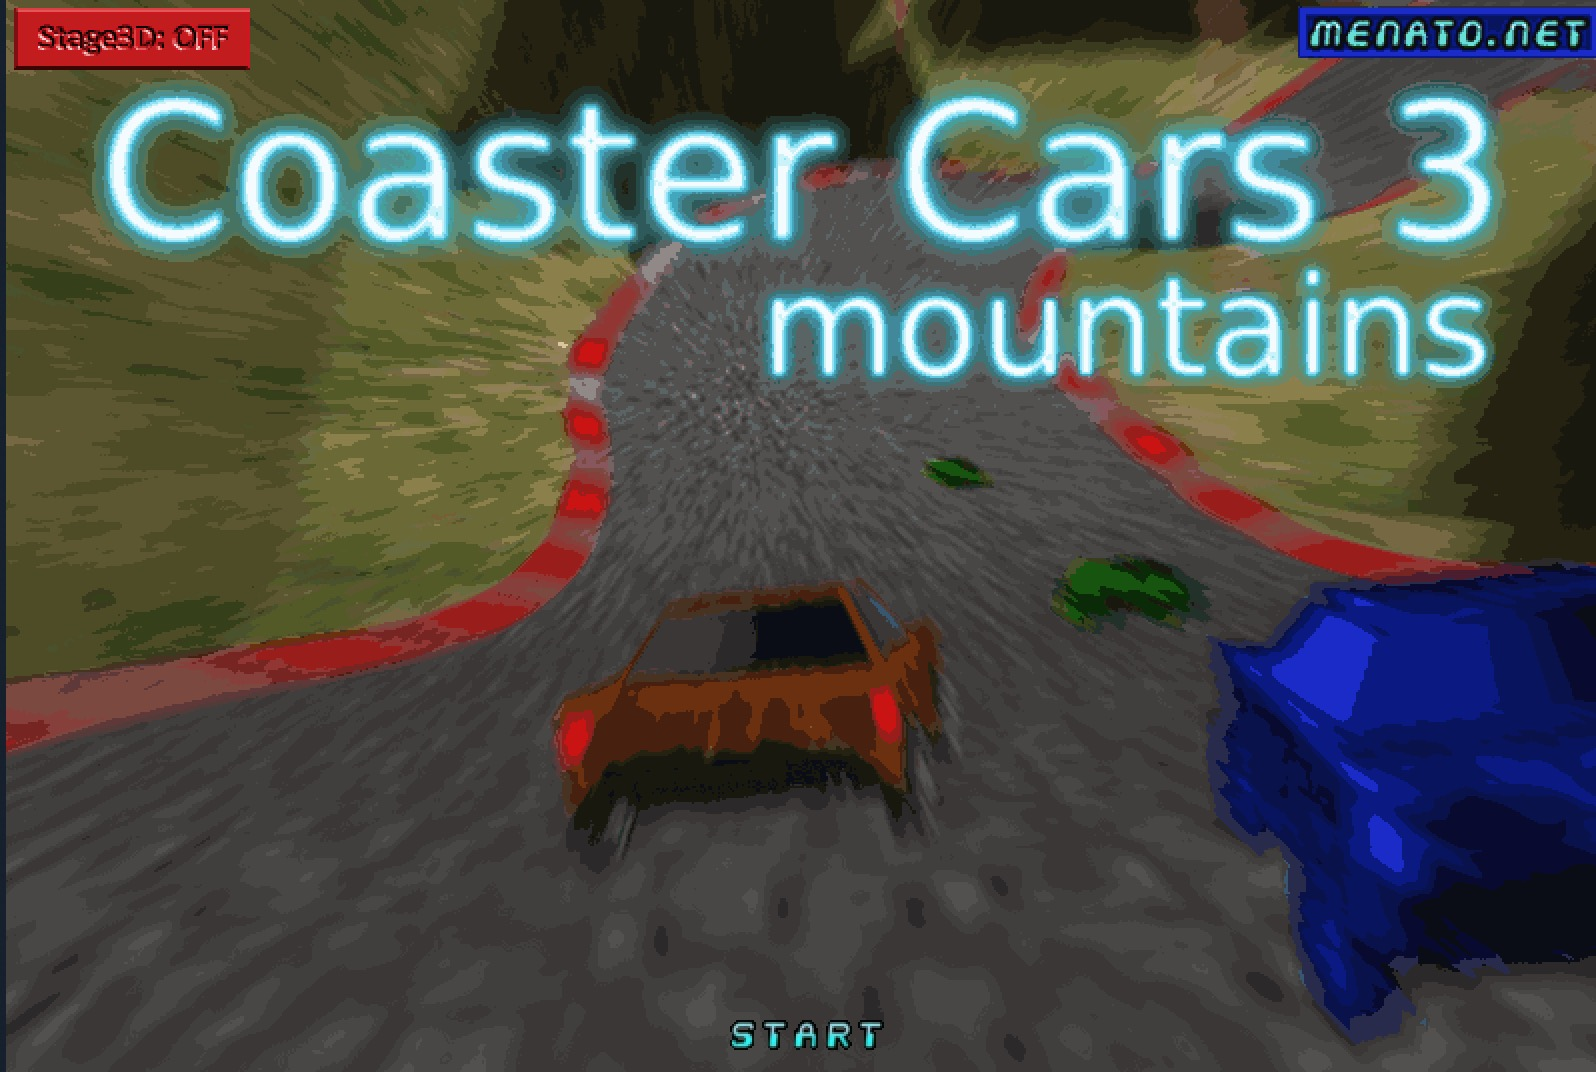 Coaster Cars 3 Mountains